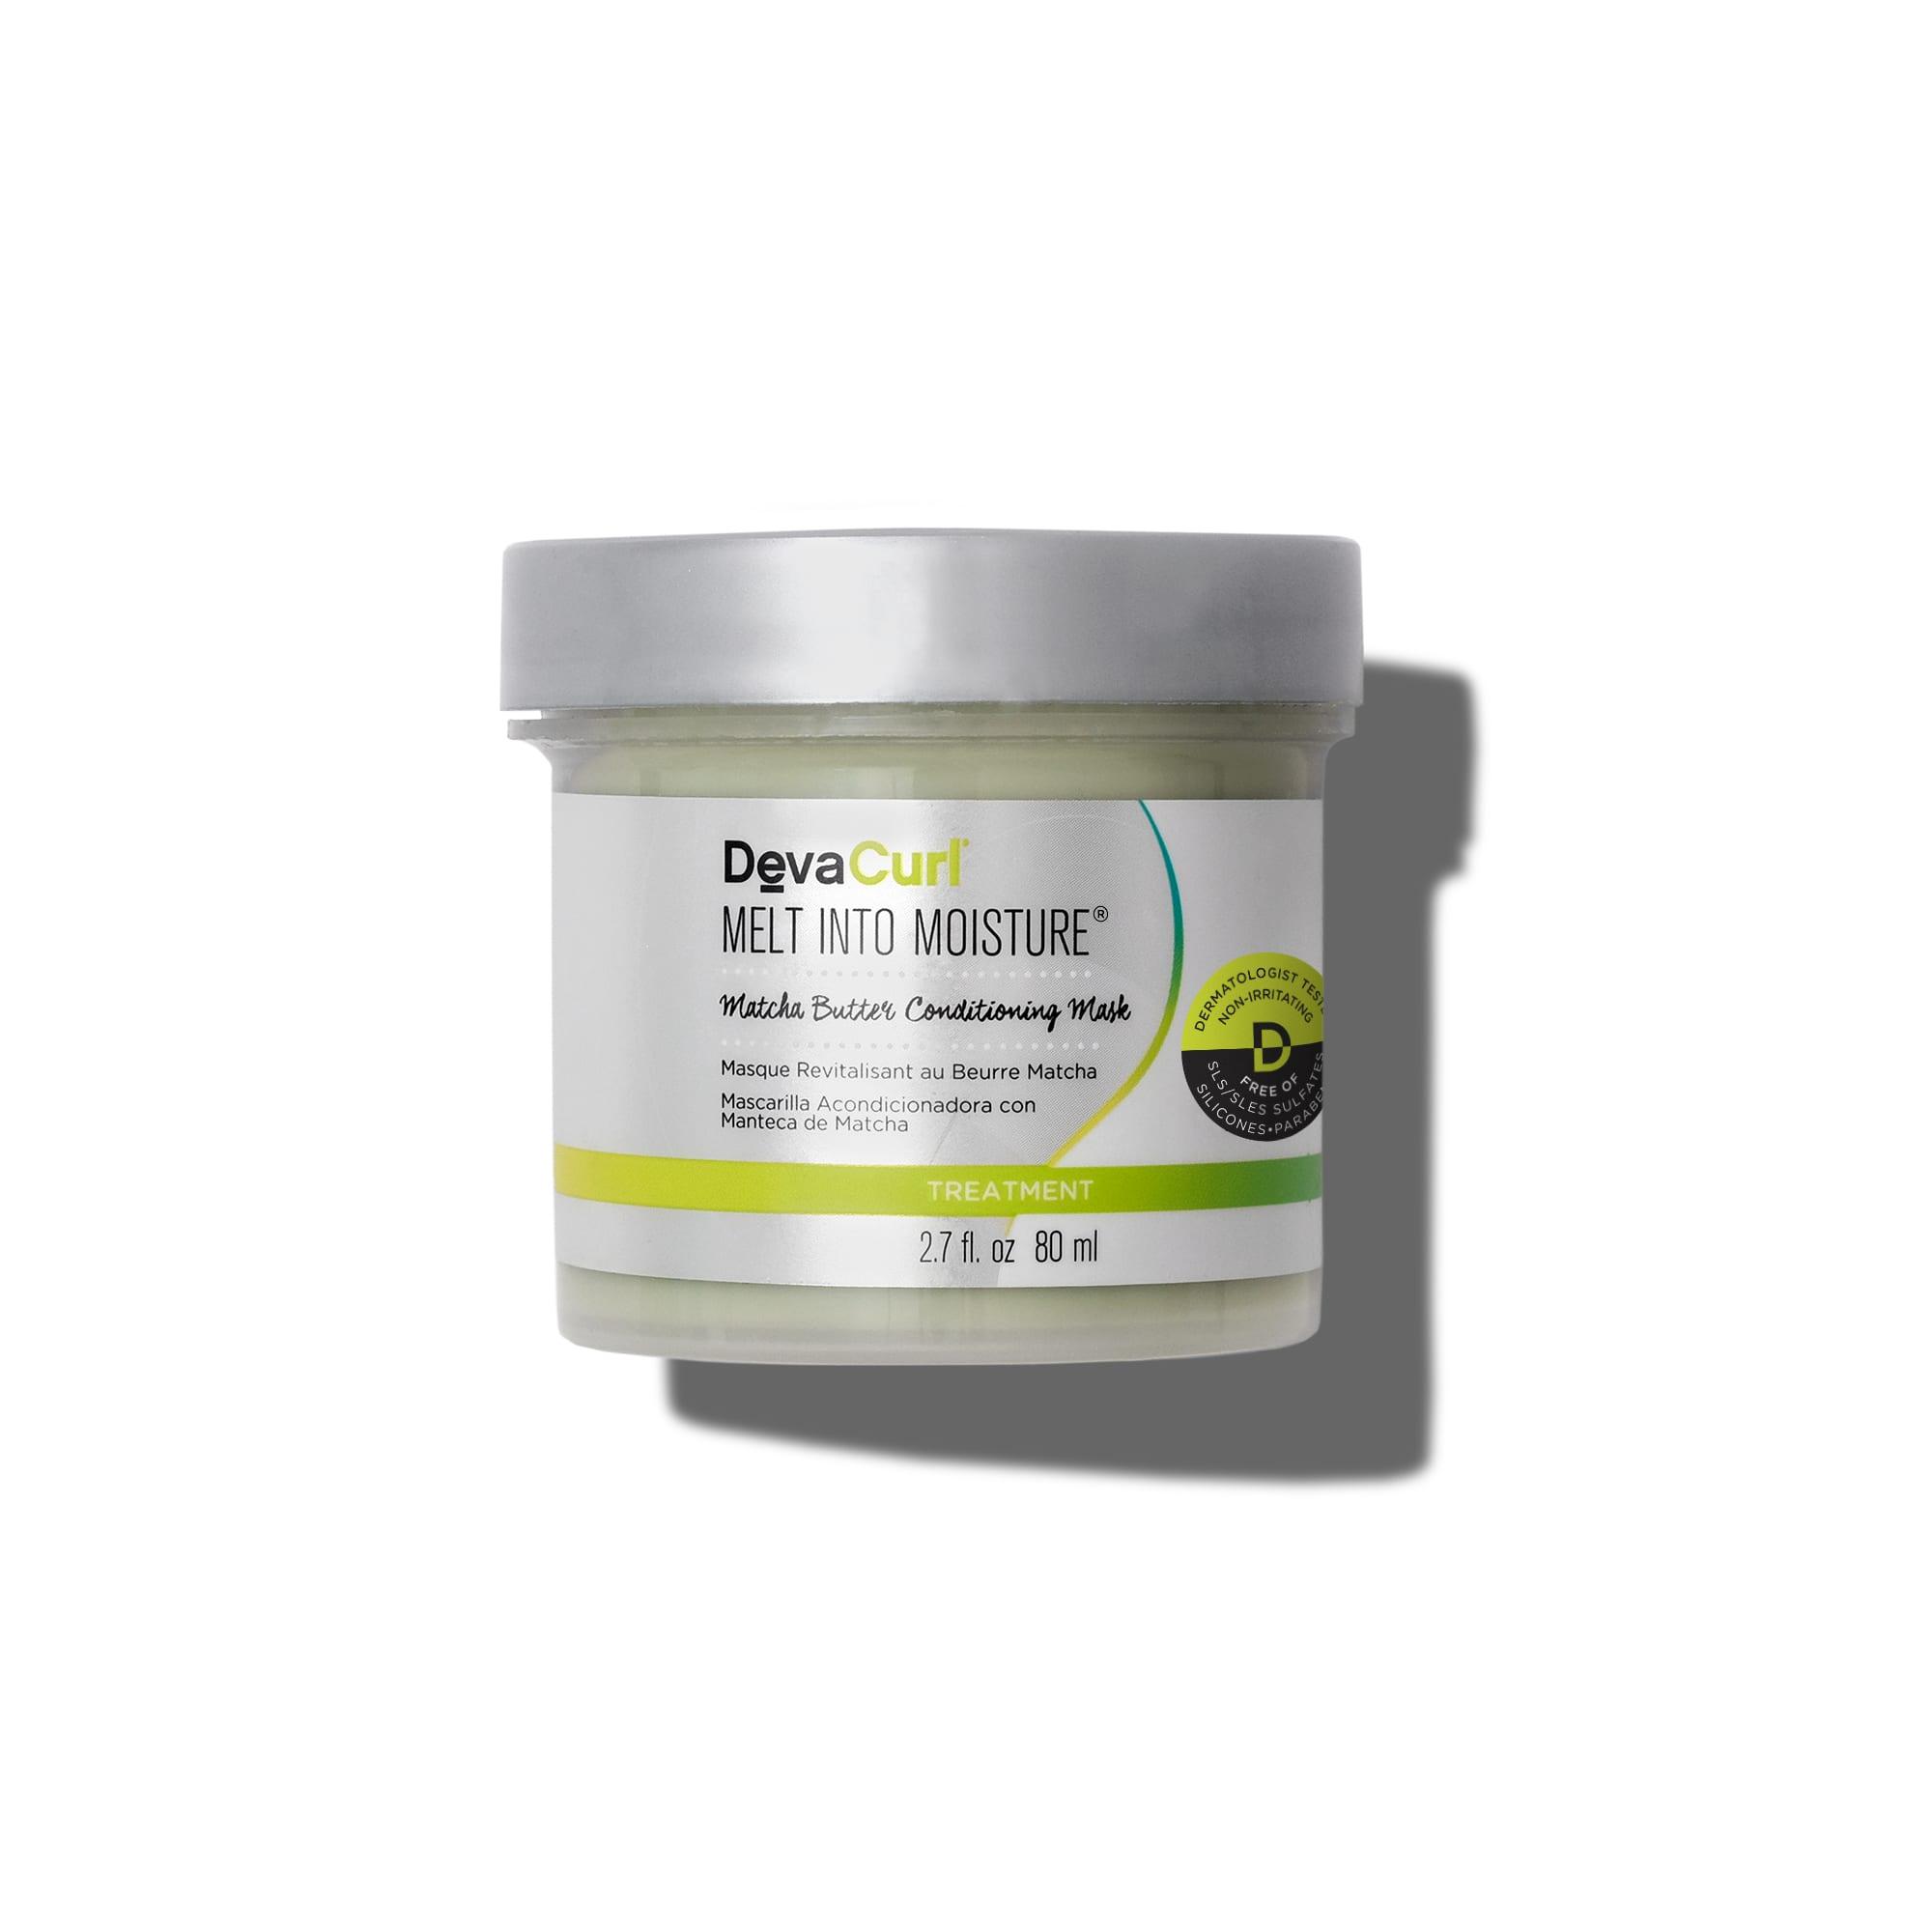 melt into moisture mask 3oz jar